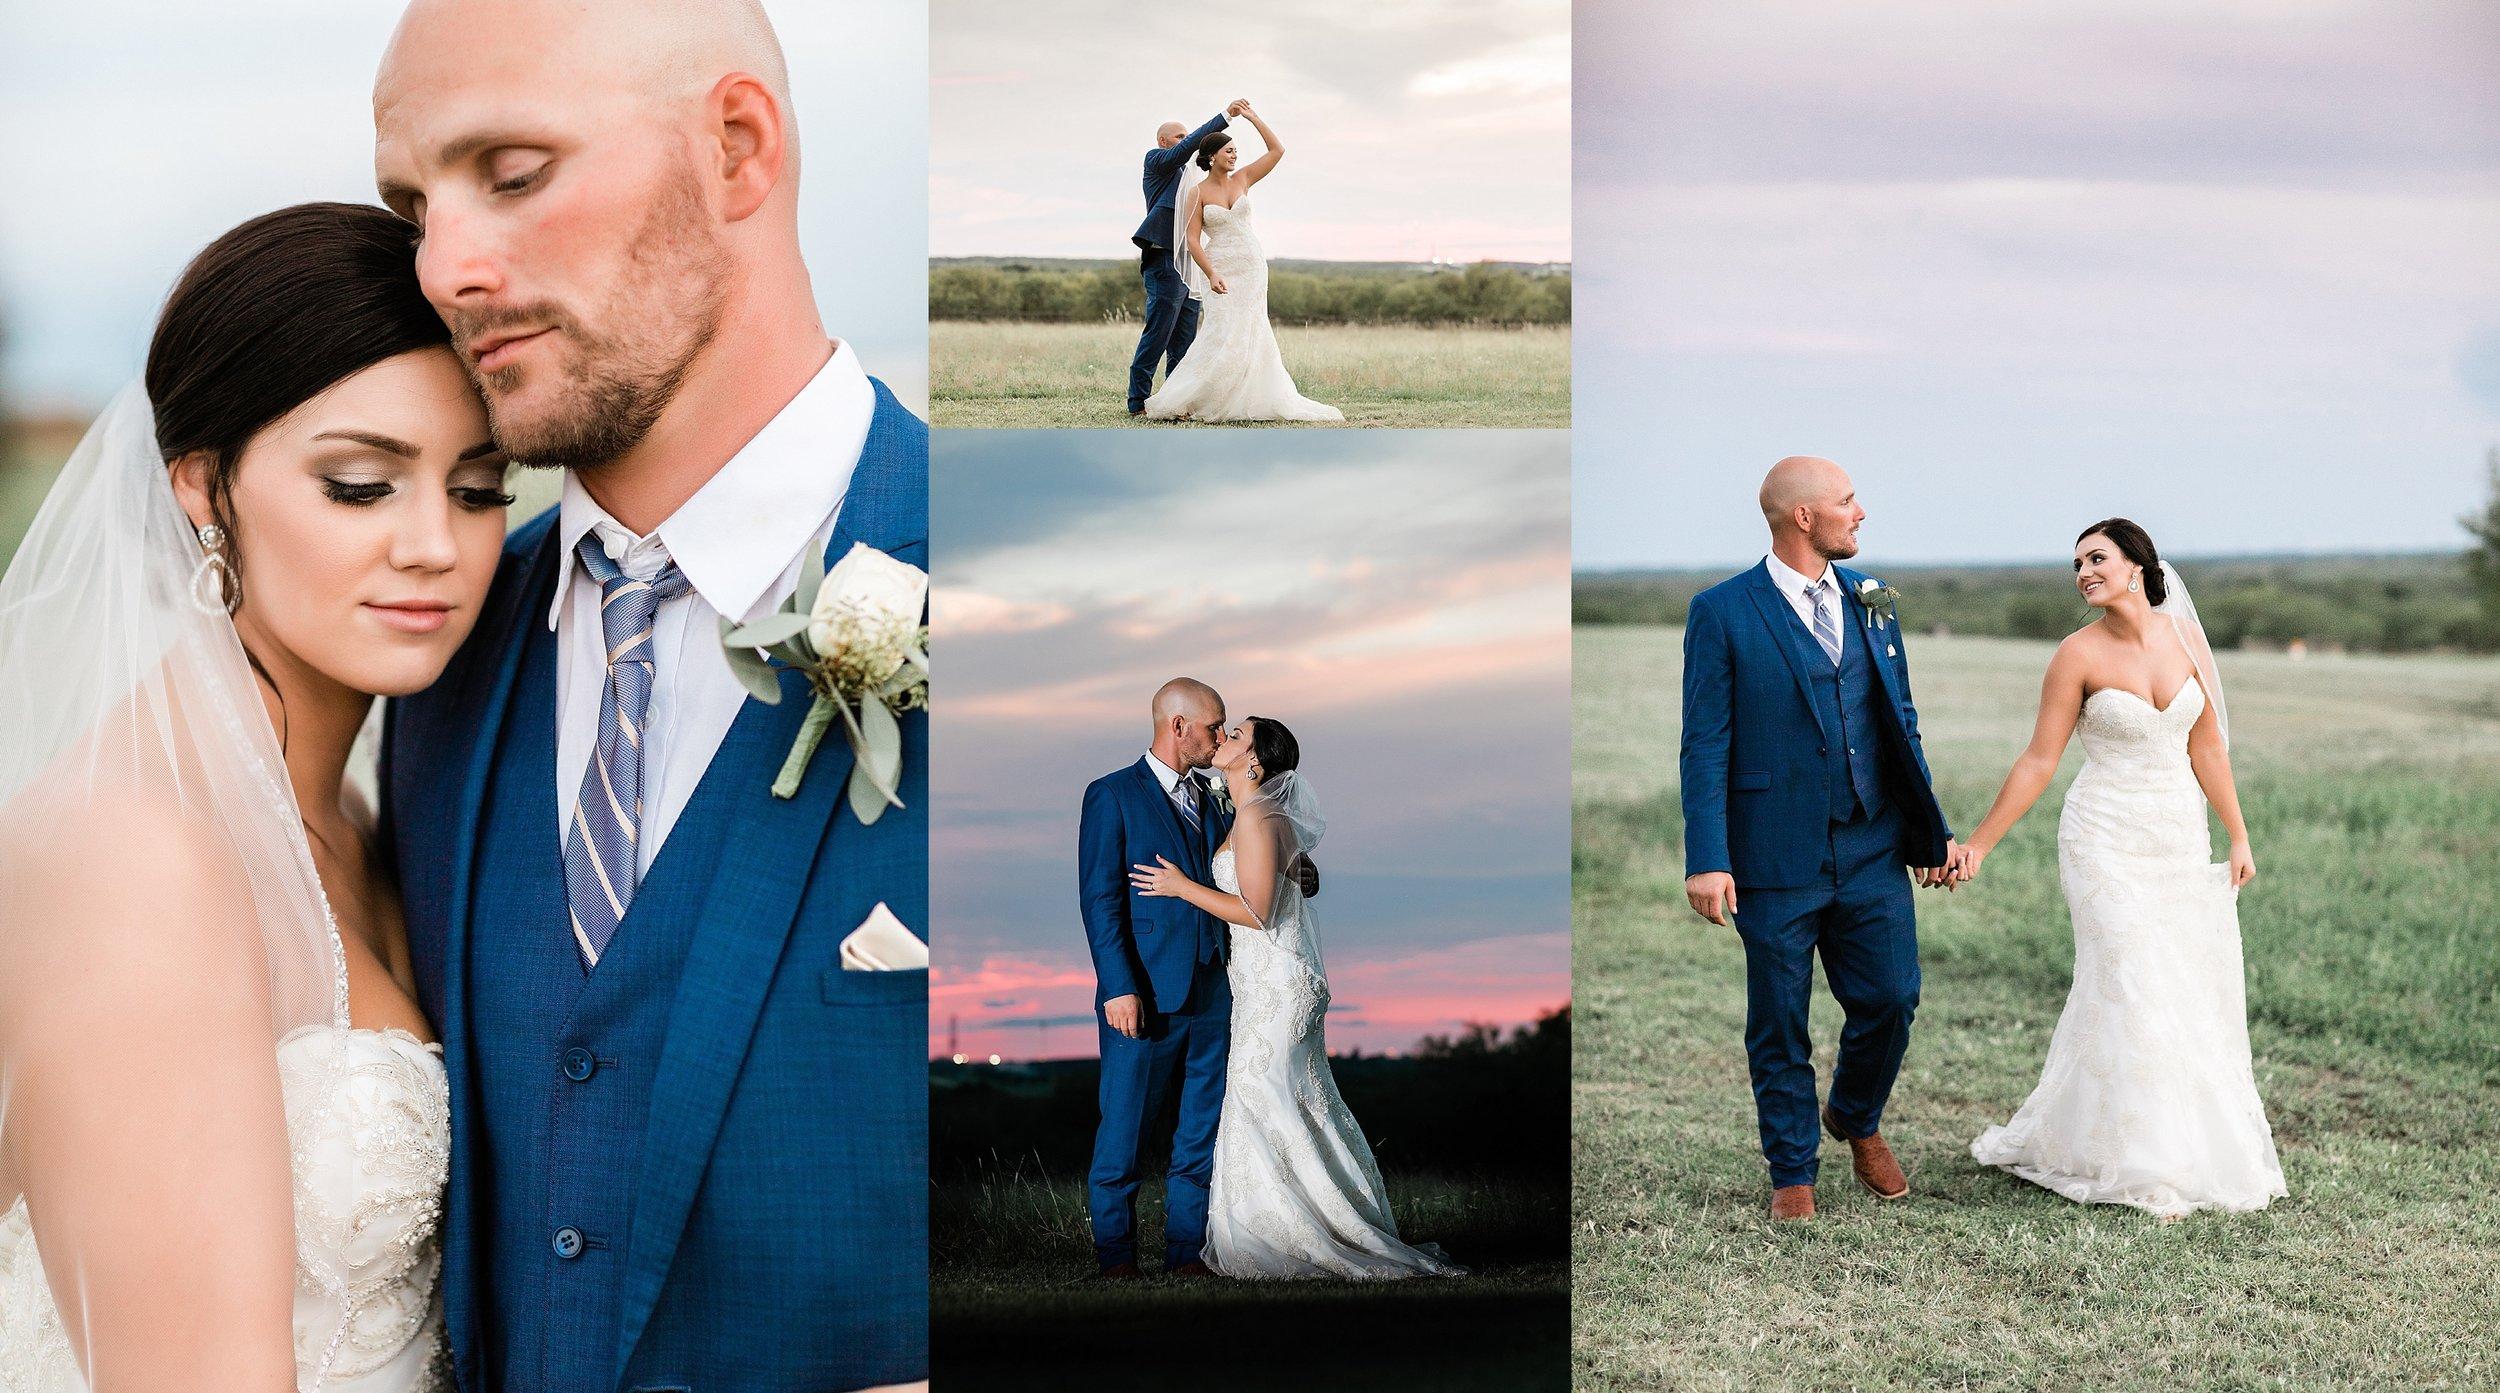 bailey-and-carl-coyote-ranch-resort-wedding-photographer-wichita-falls-texas-destination-wedding-0057.jpg